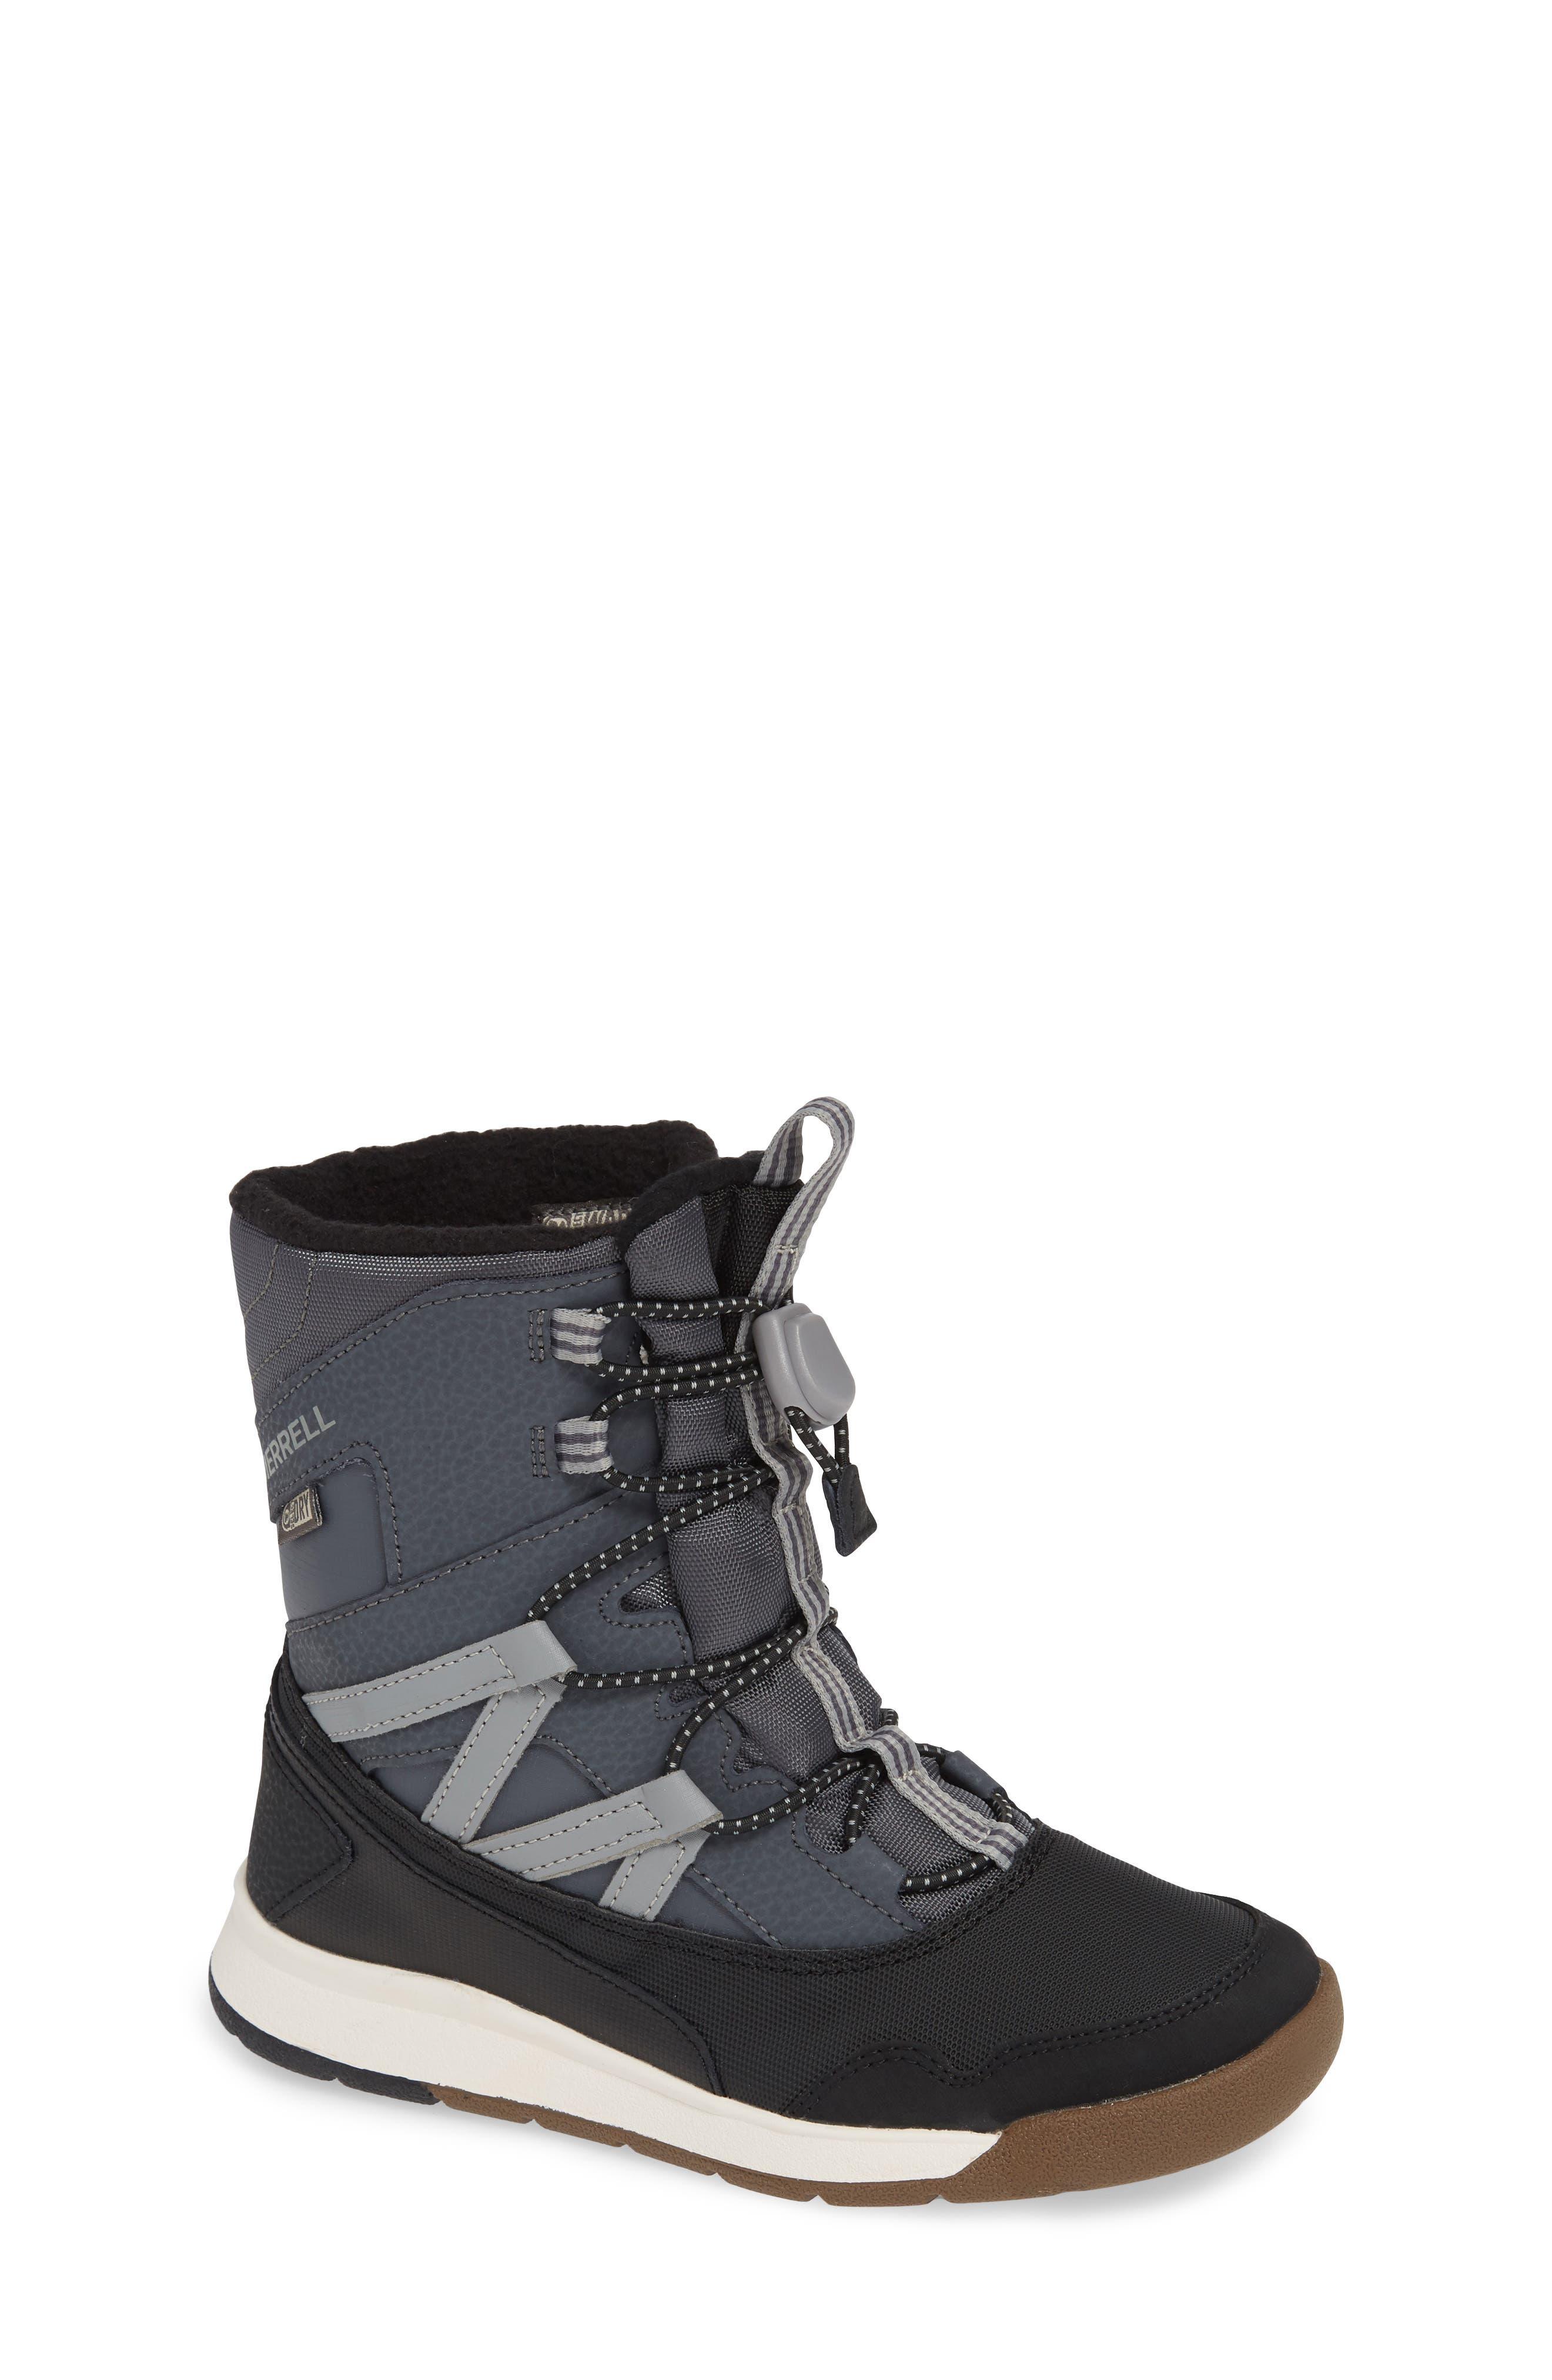 MERRELL, Snow Crush Waterproof Snow Boot, Main thumbnail 1, color, 020